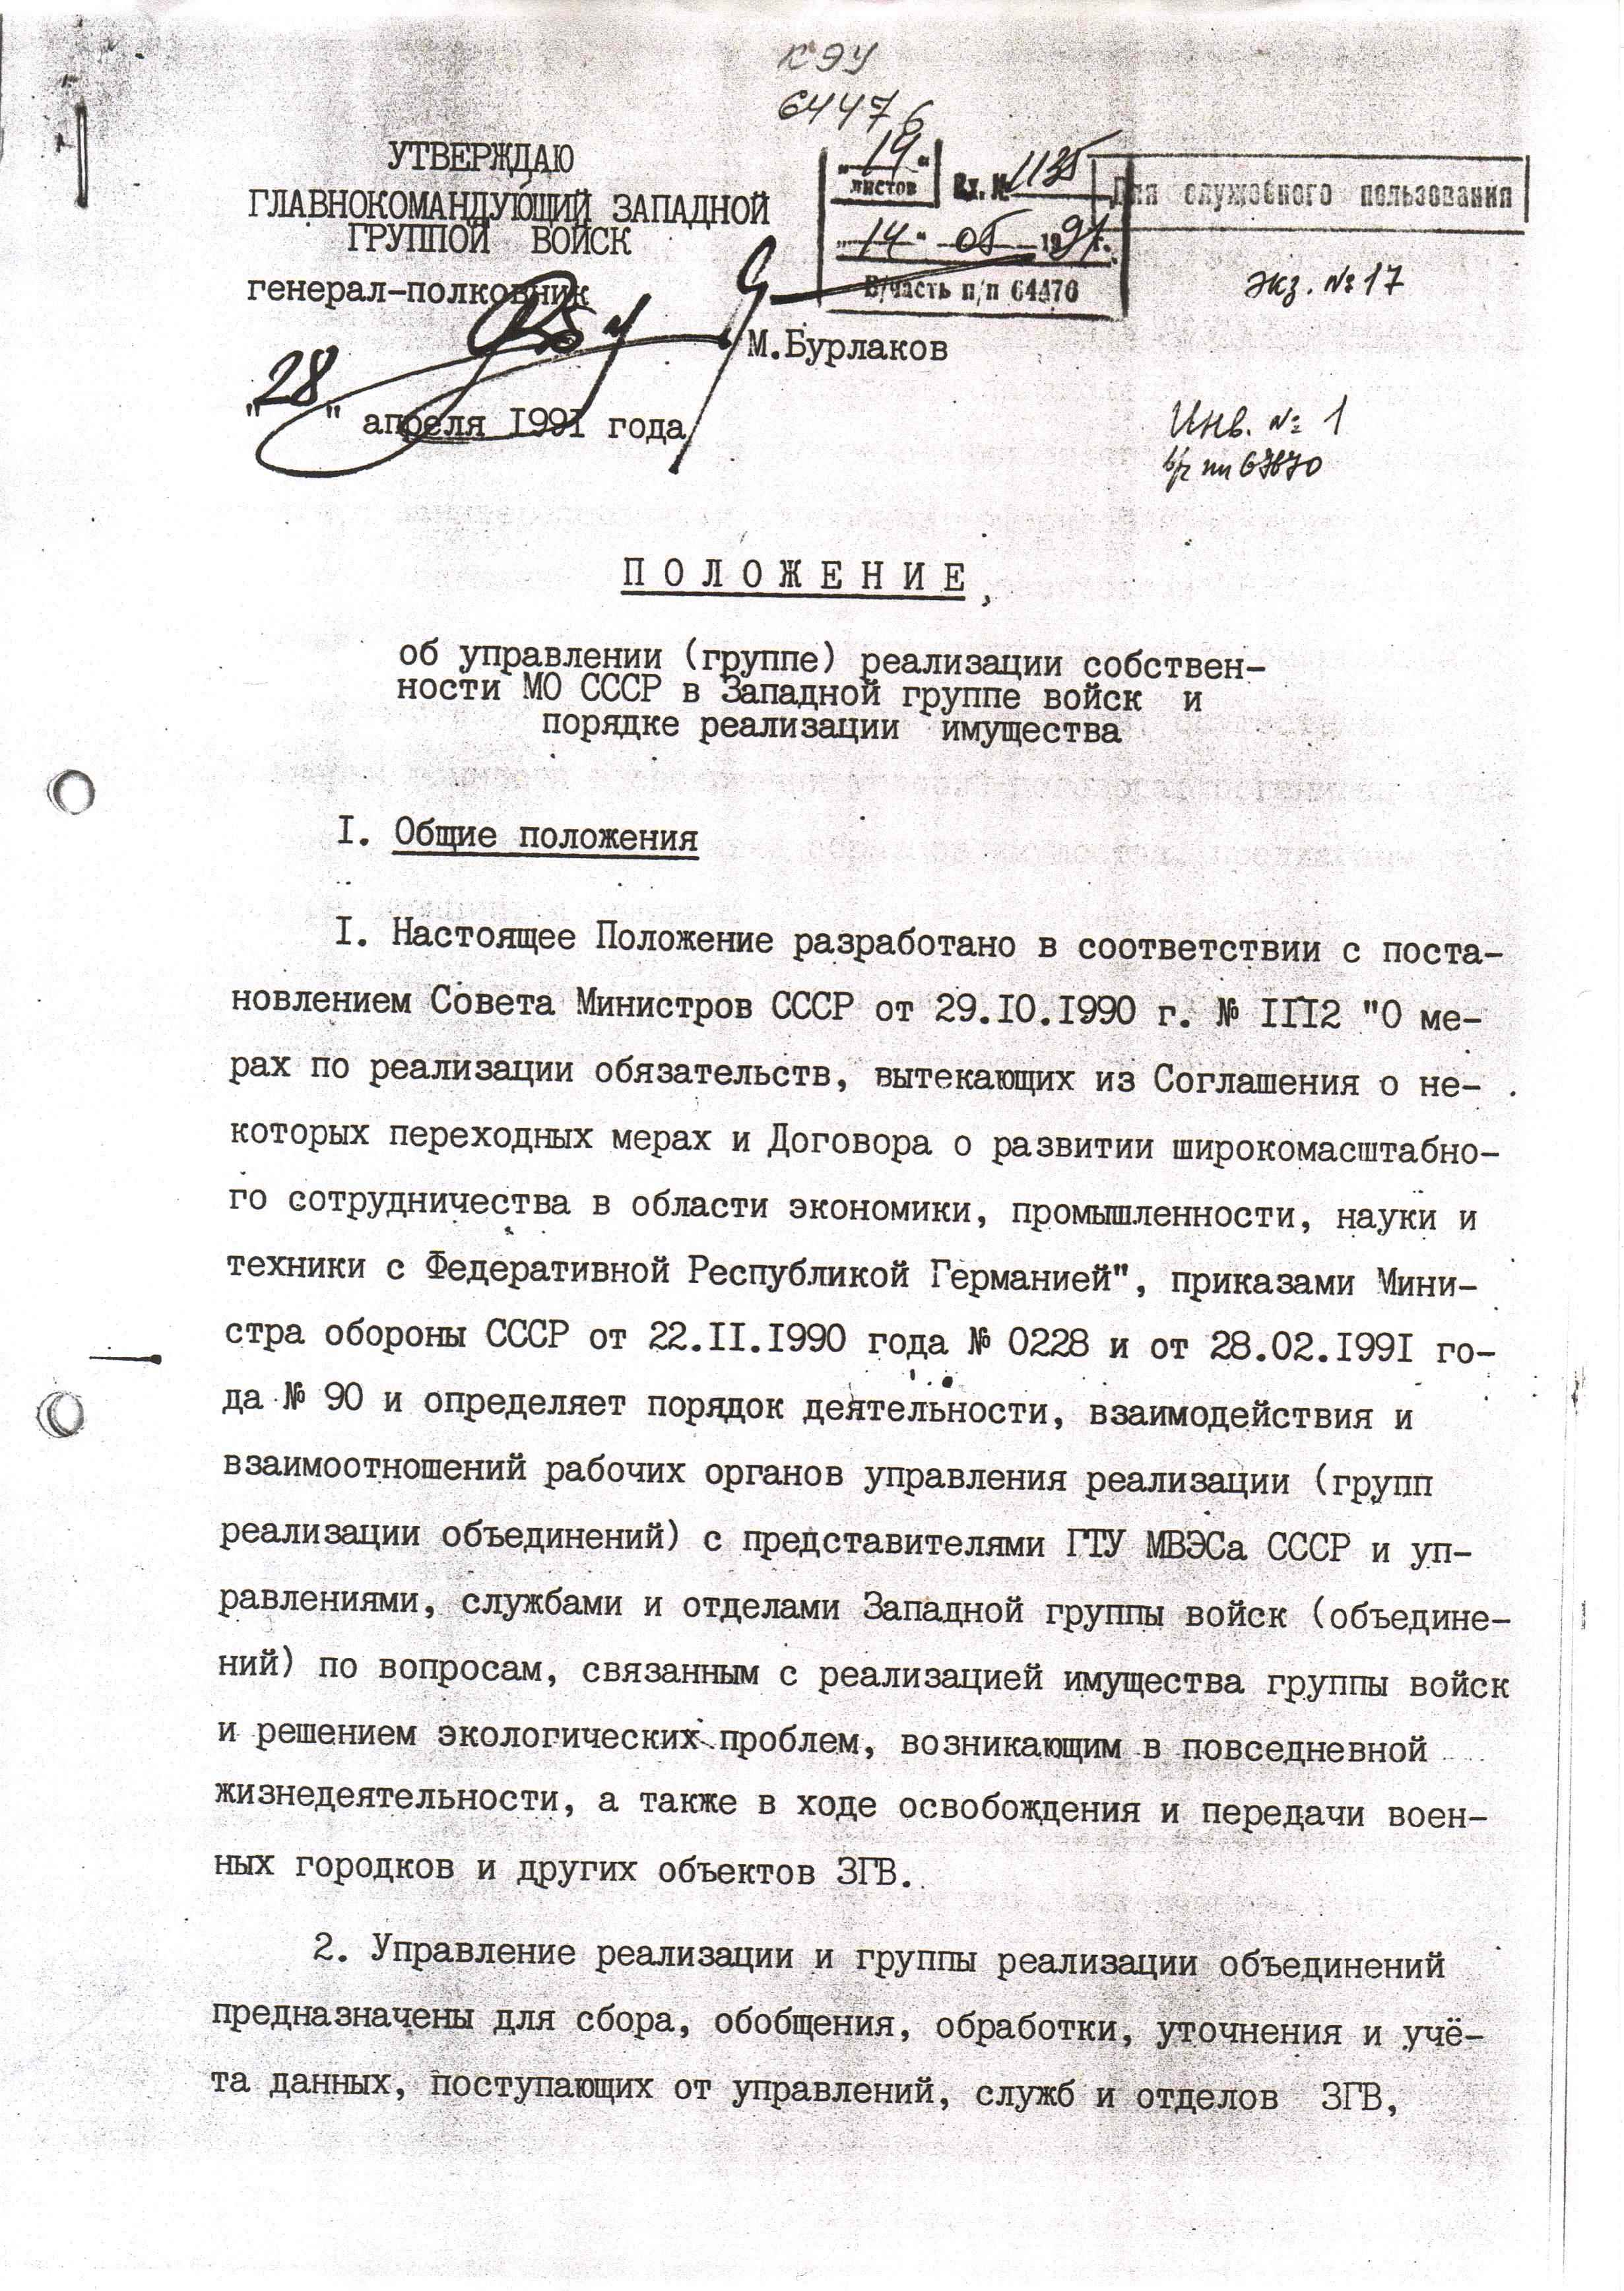 http://s0.uploads.ru/JOlAe.jpg